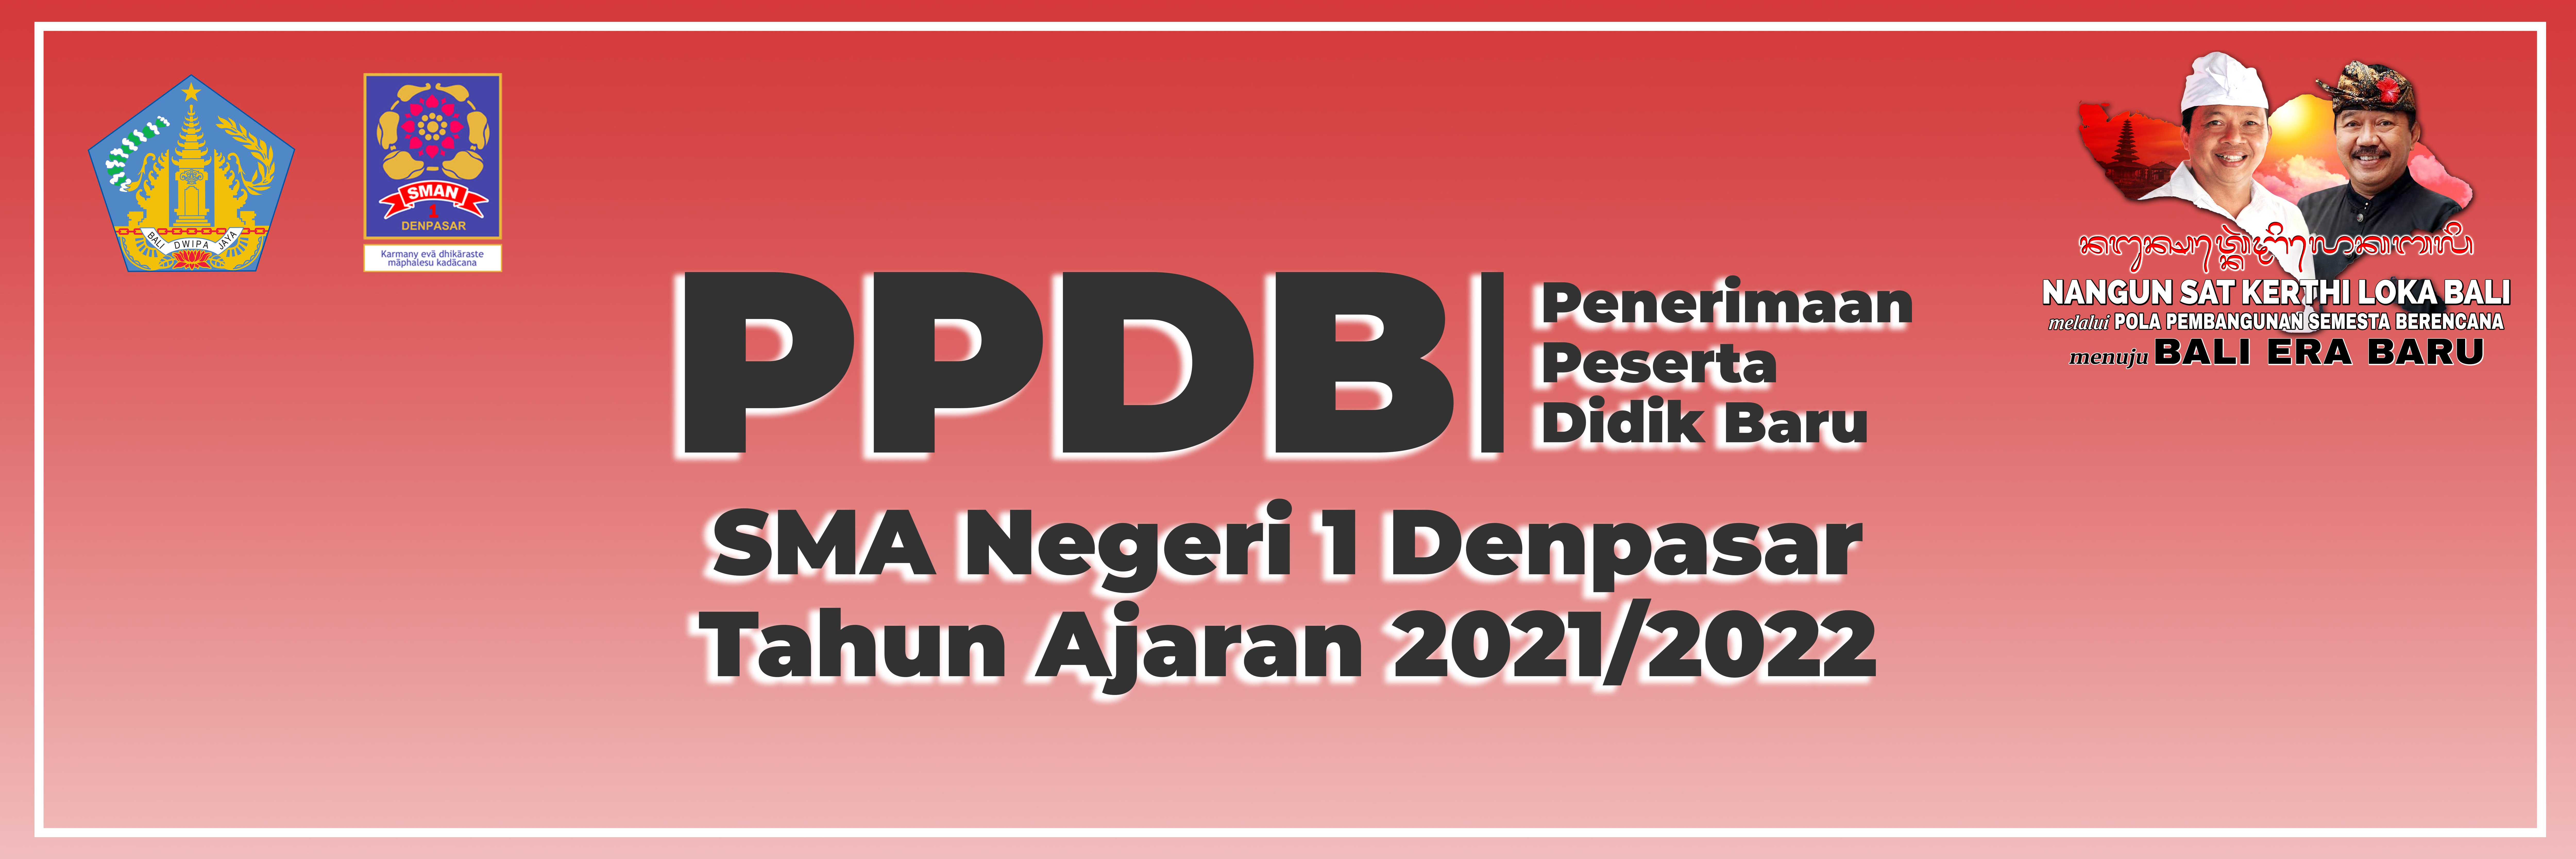 INFORMASI PPDB SMAN 1 DENPASAR TP 2021/2022